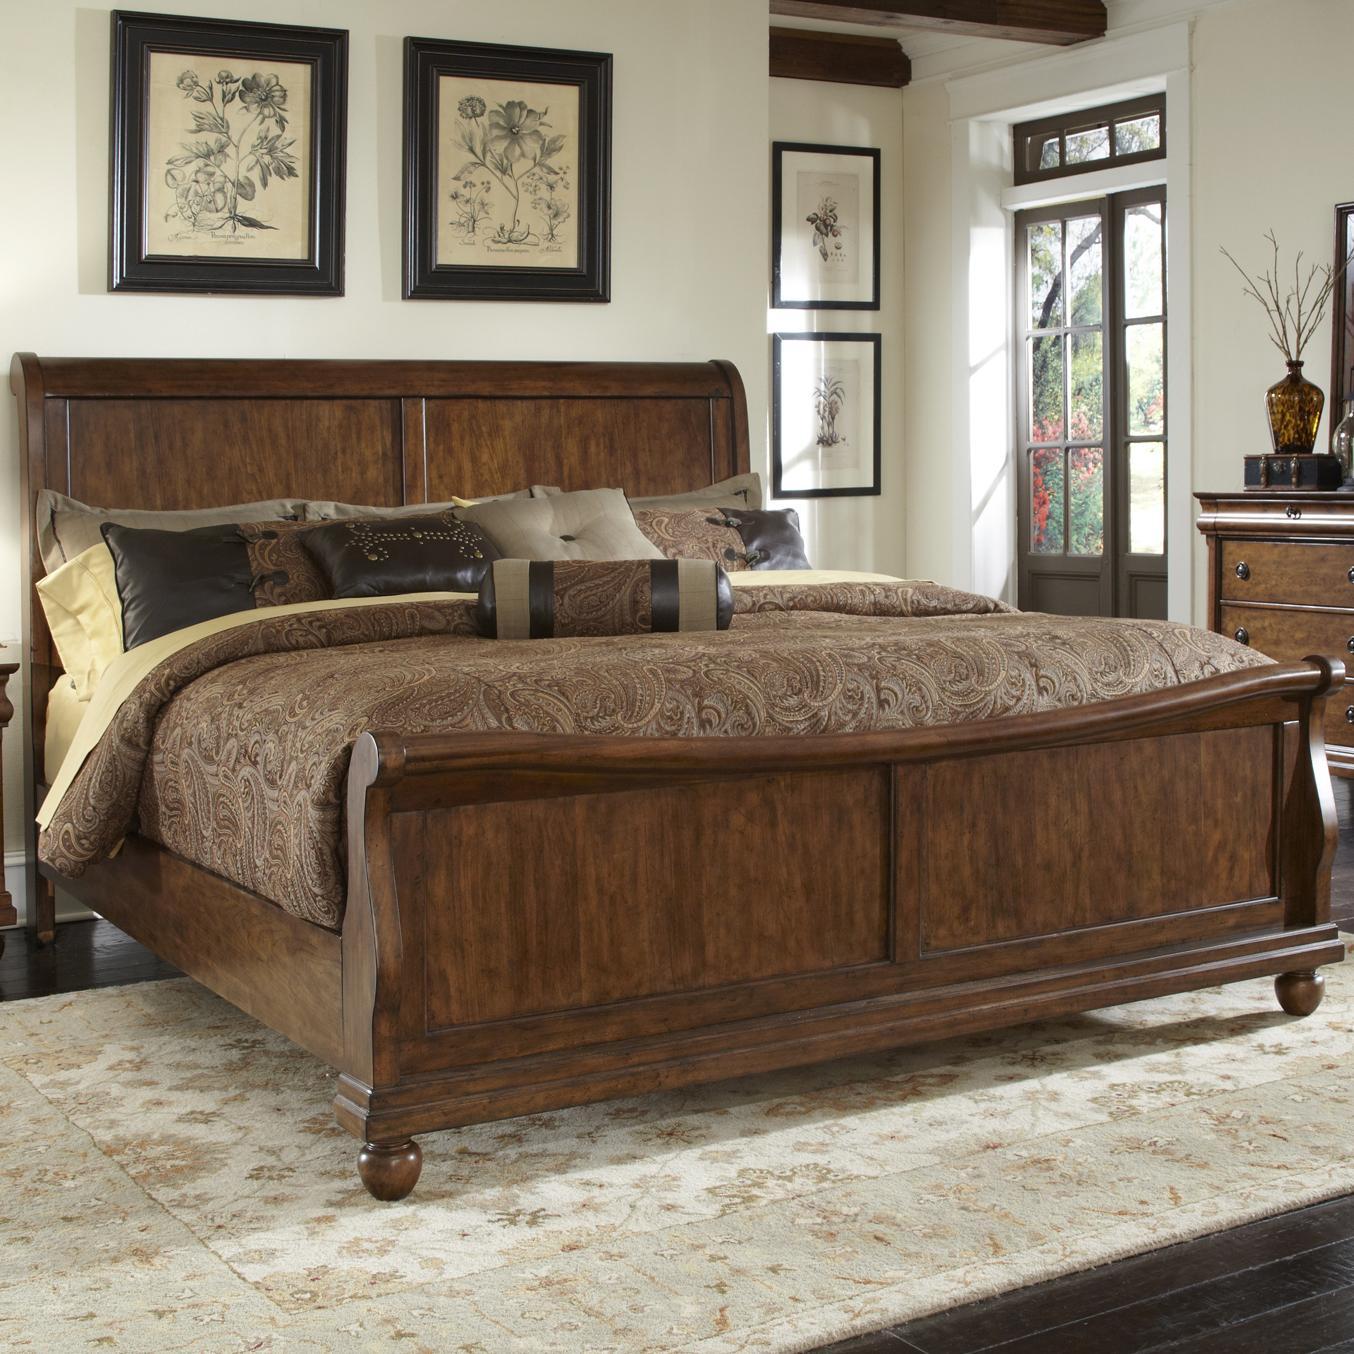 Queen Sleigh Bed Set with Bun Feet